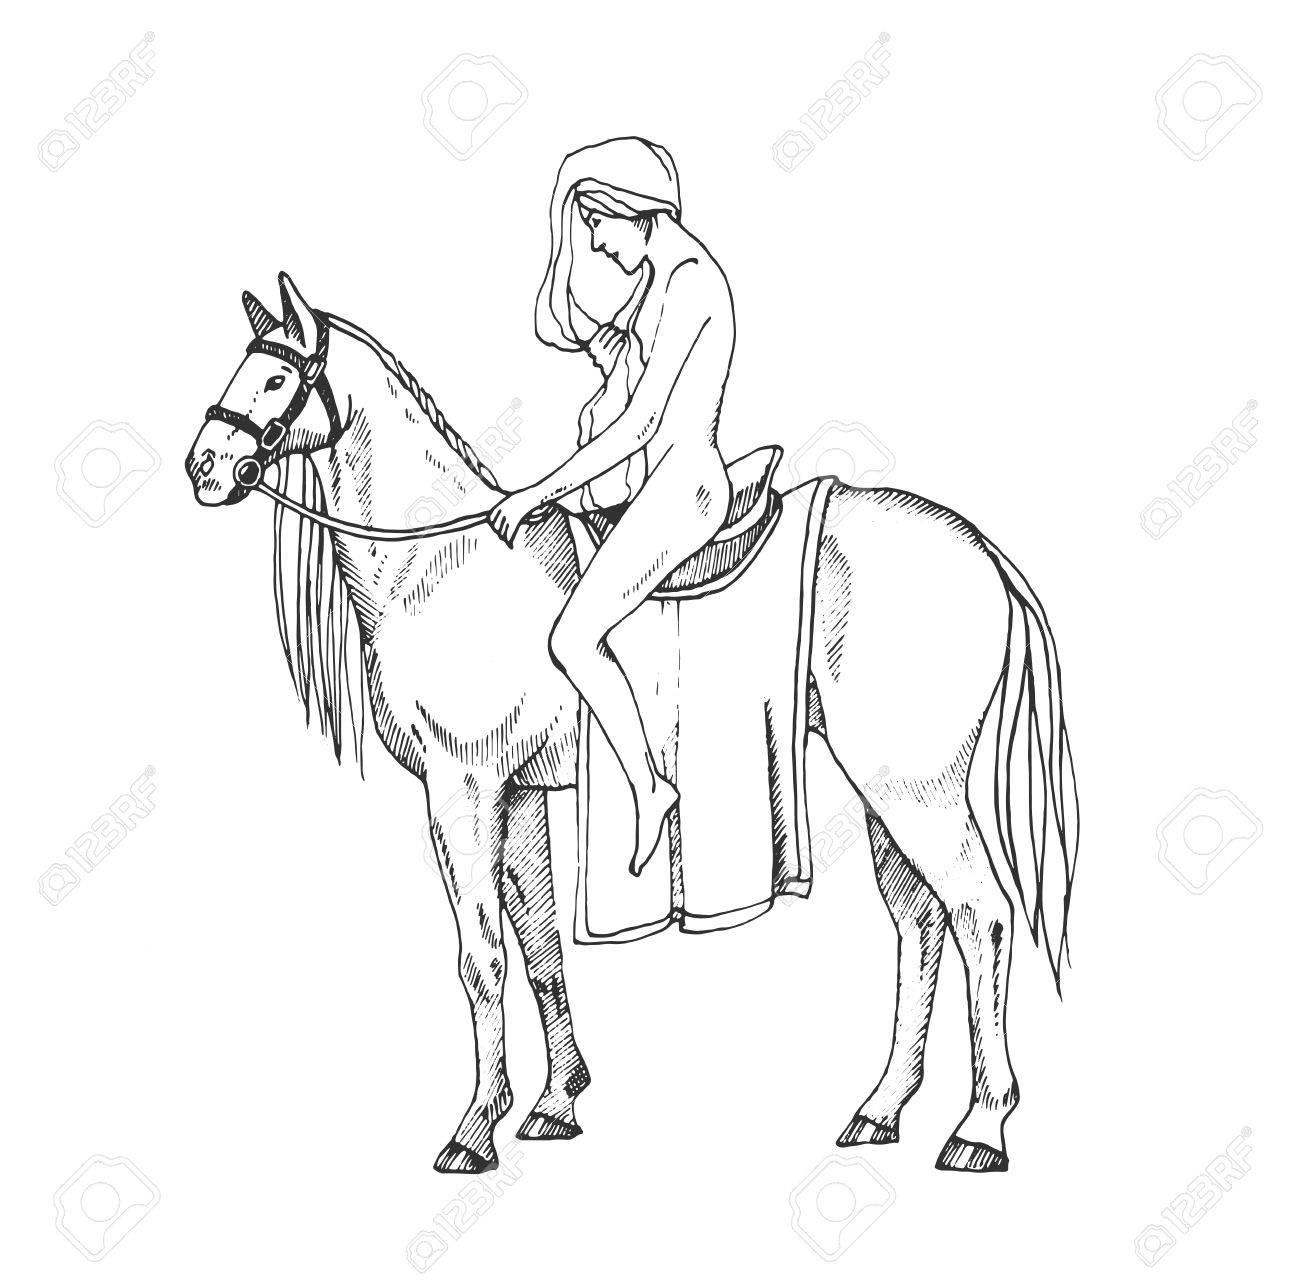 Nude women riding a horse. Lady Godiva. Contour illustration. Stock Vector  - 73587592